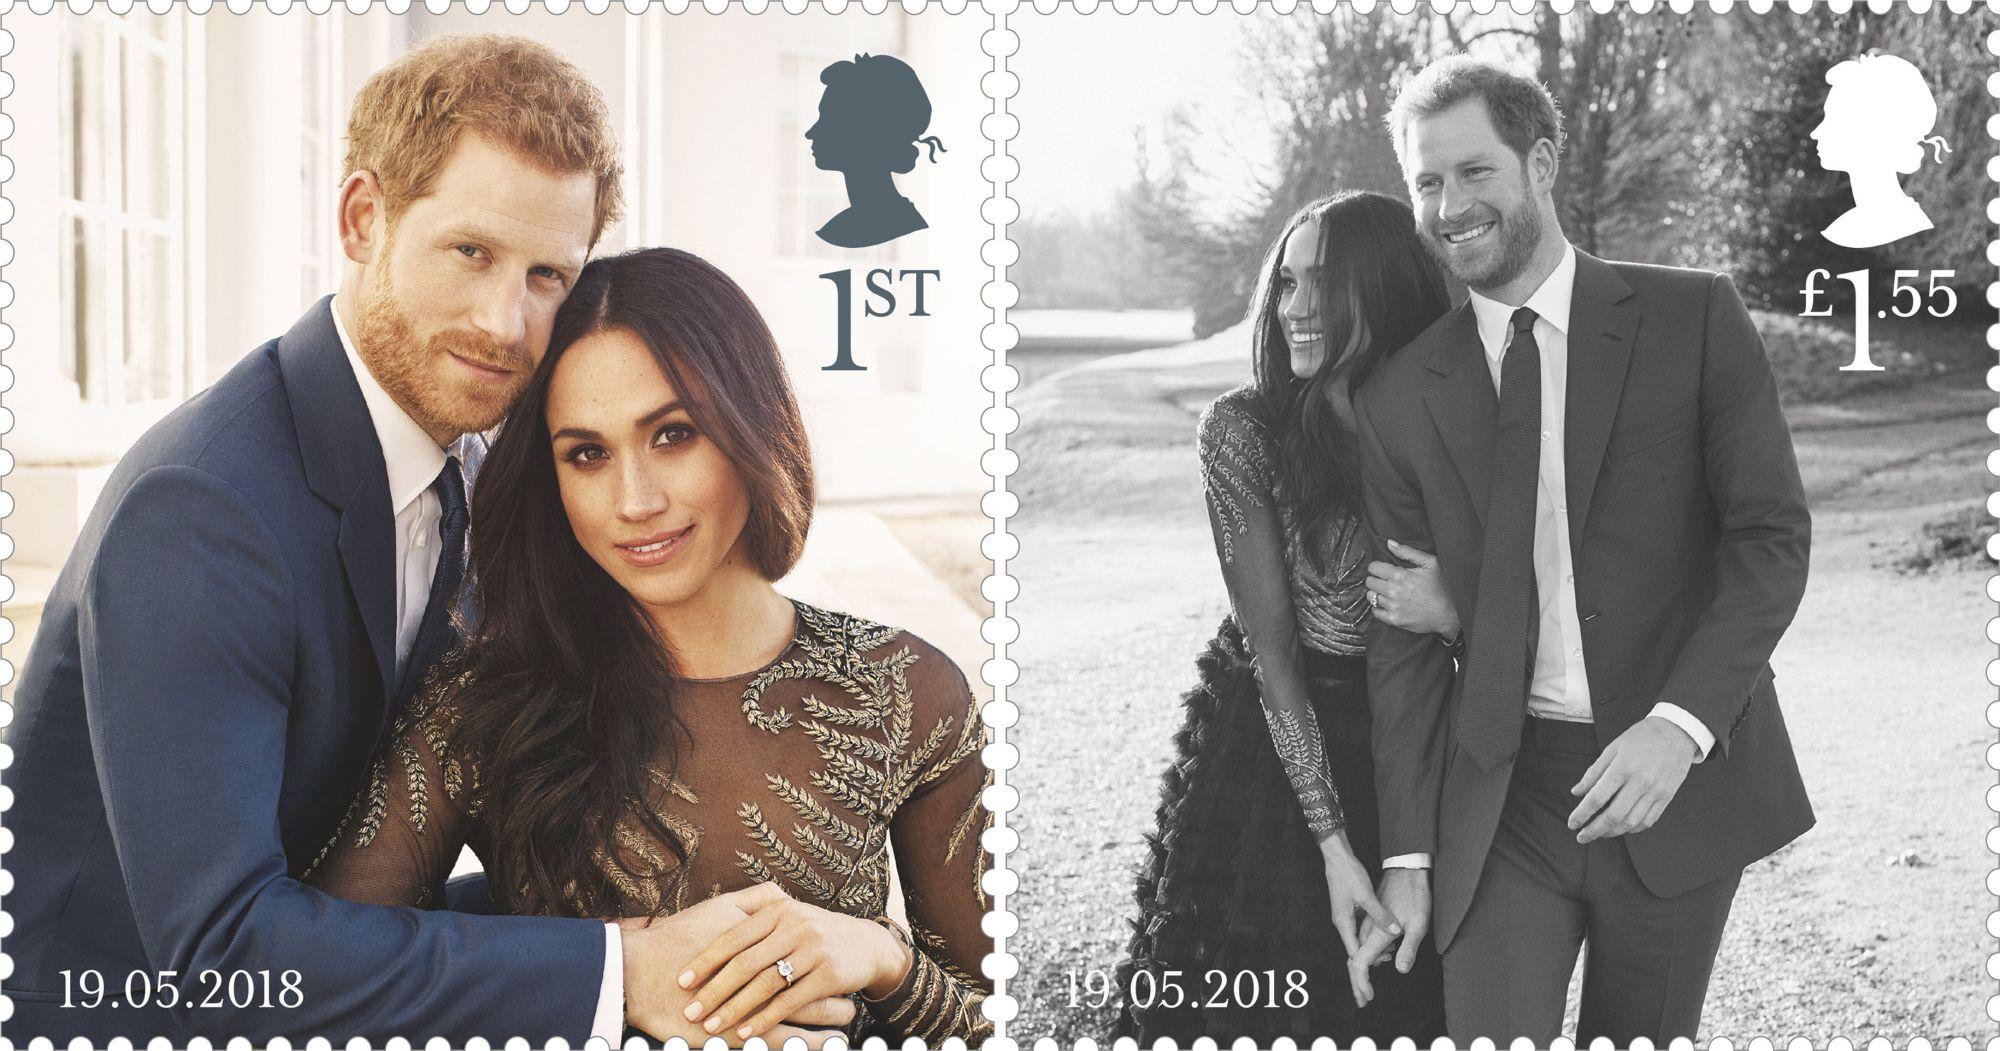 Stamps and nerves: royal wedding news digest